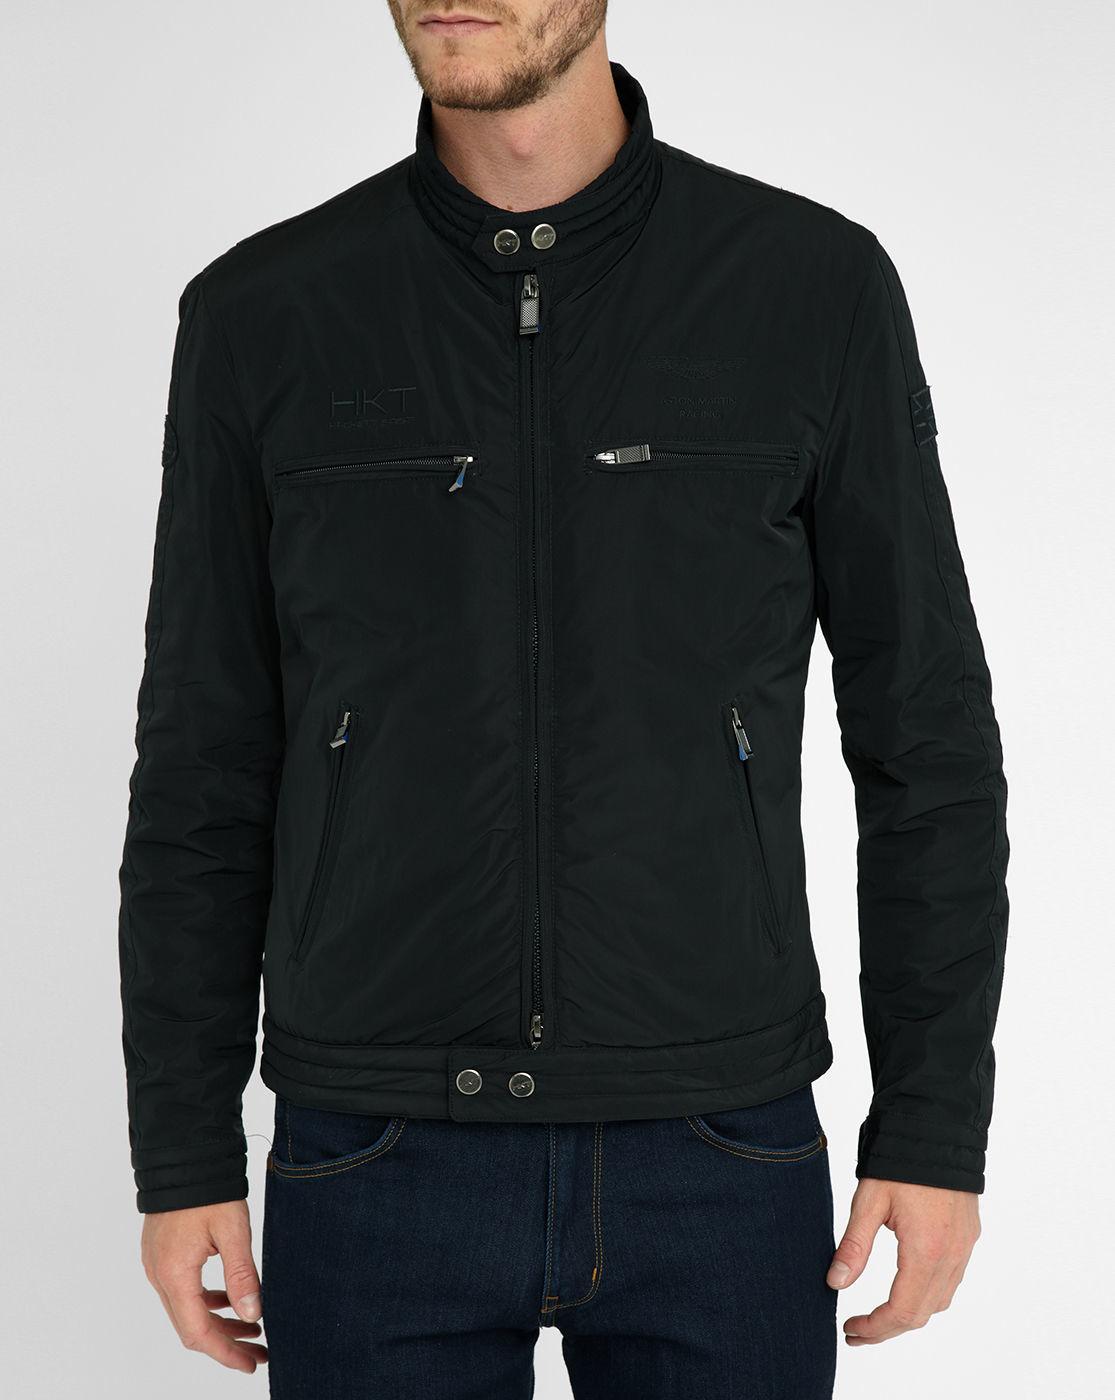 hackett black aston martin jacket in black for men lyst. Black Bedroom Furniture Sets. Home Design Ideas